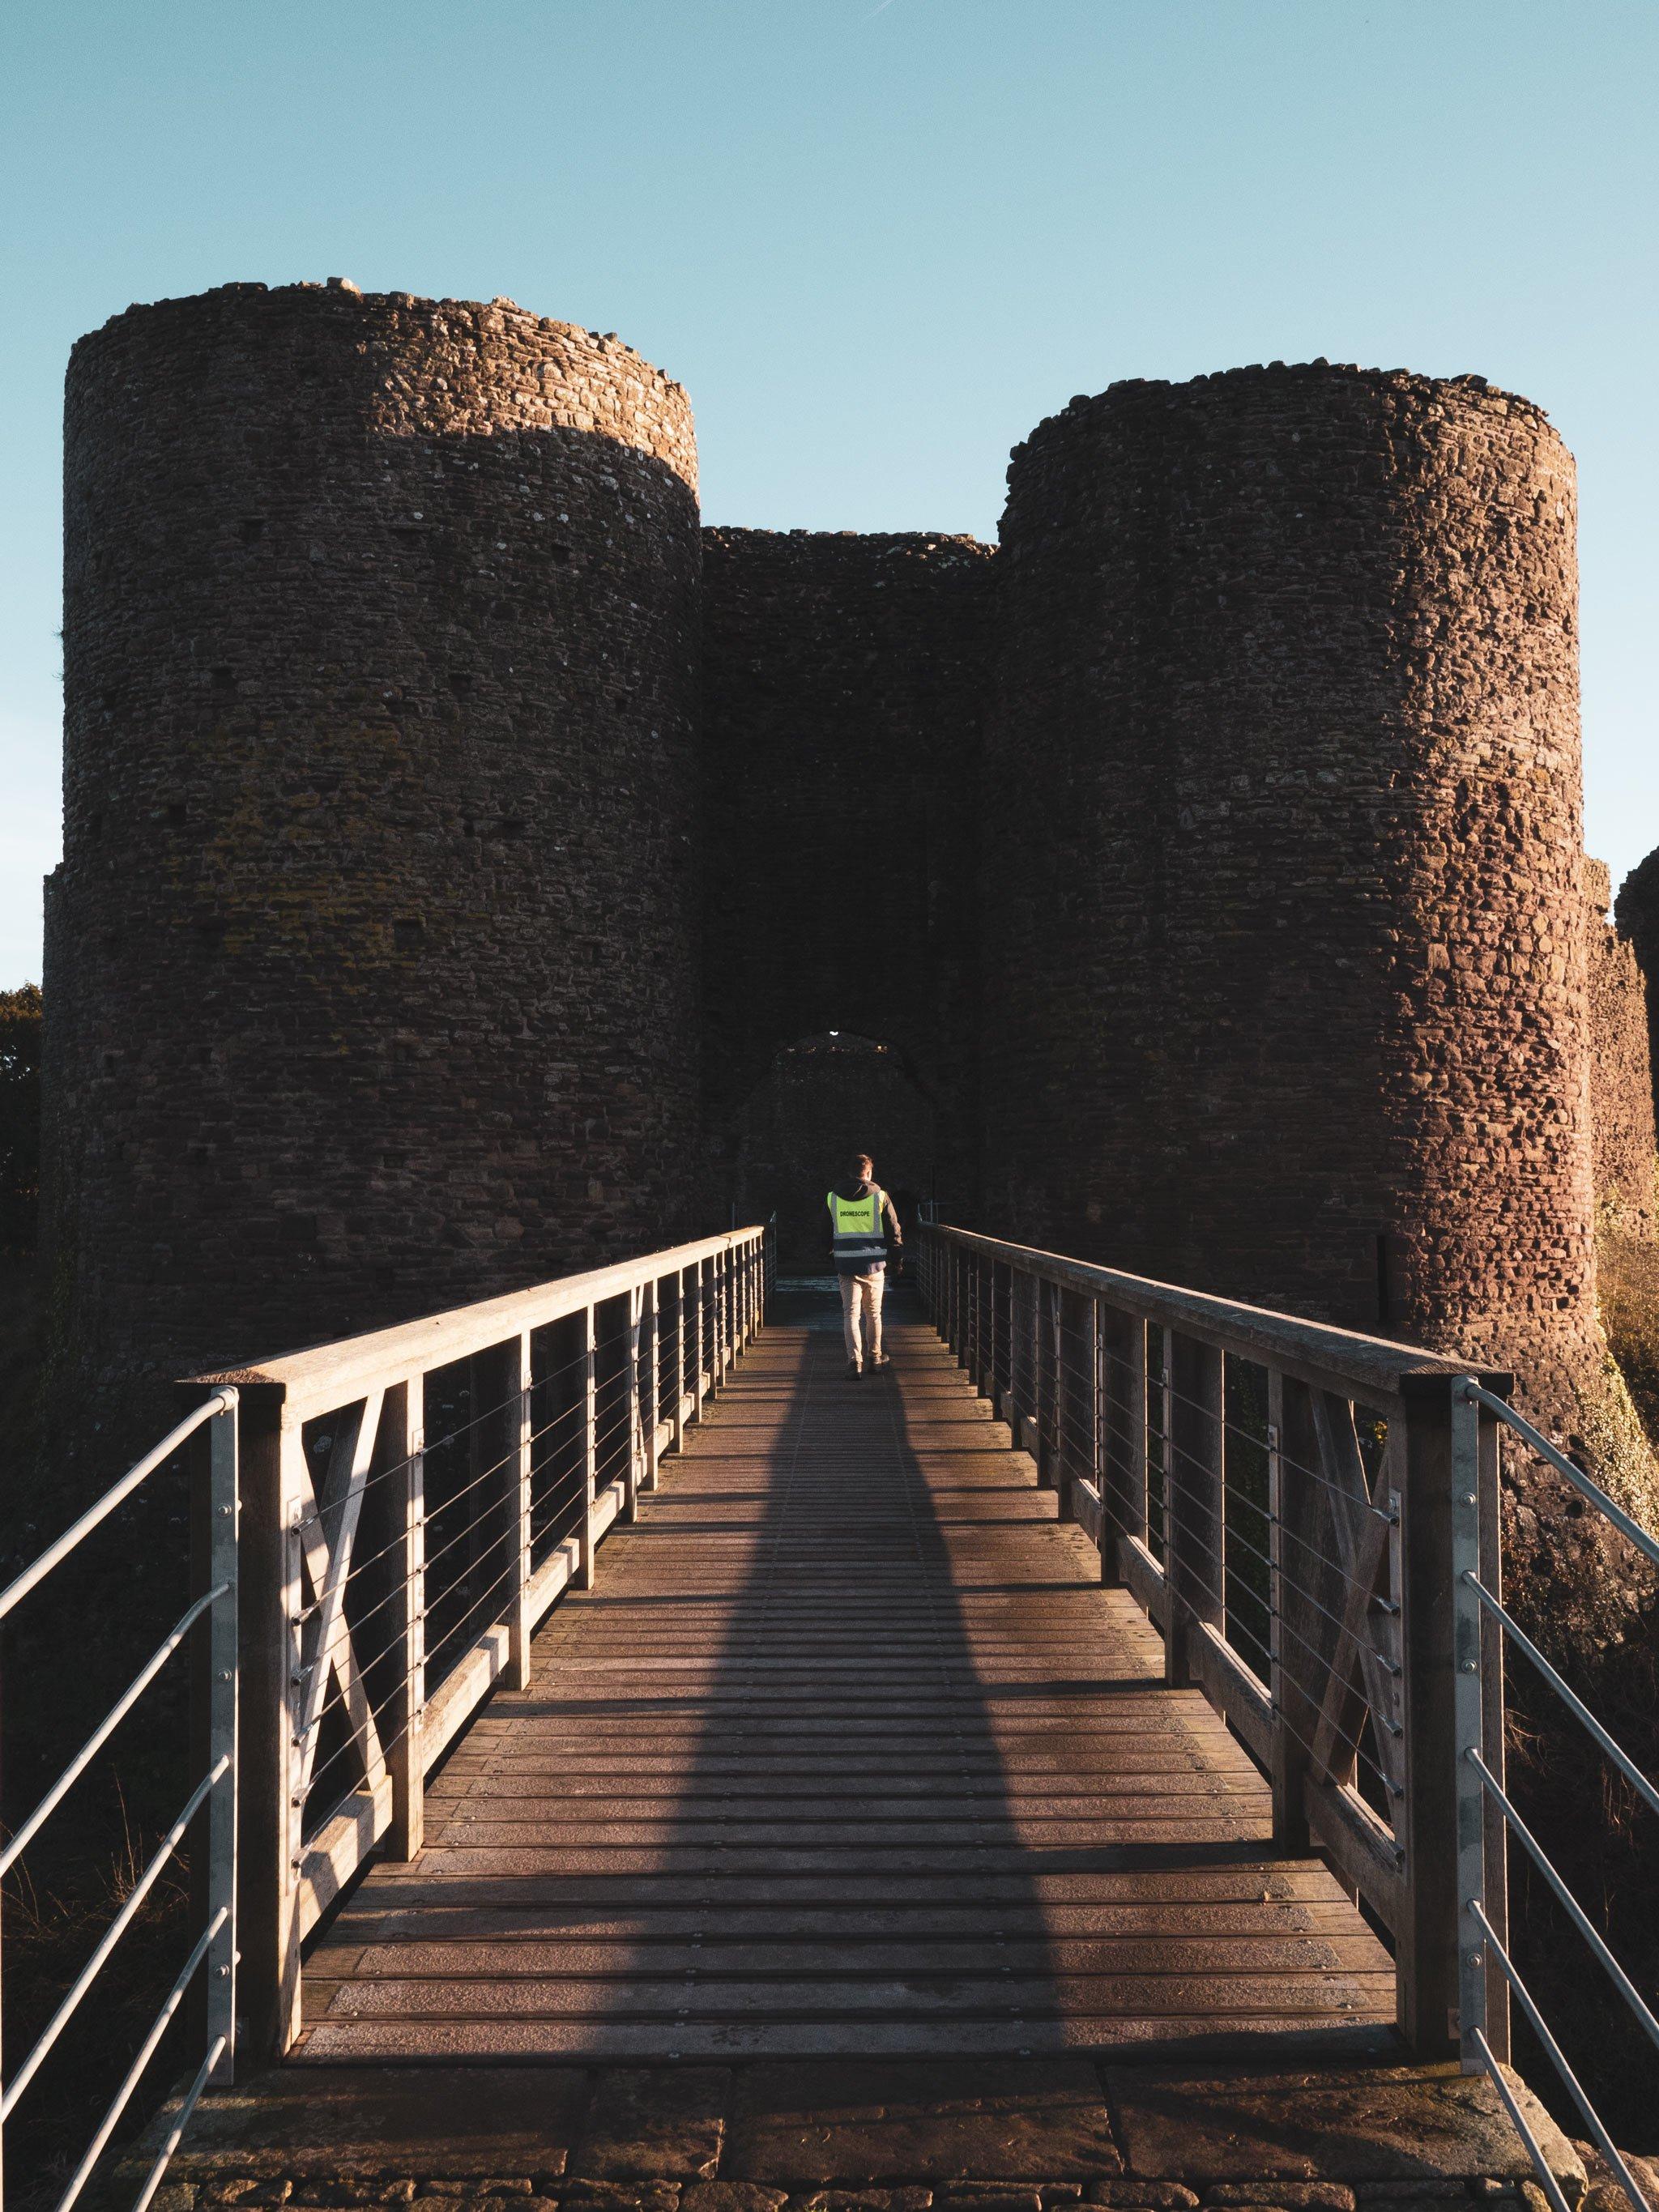 DroneScope crew crossing a bridge into a castle